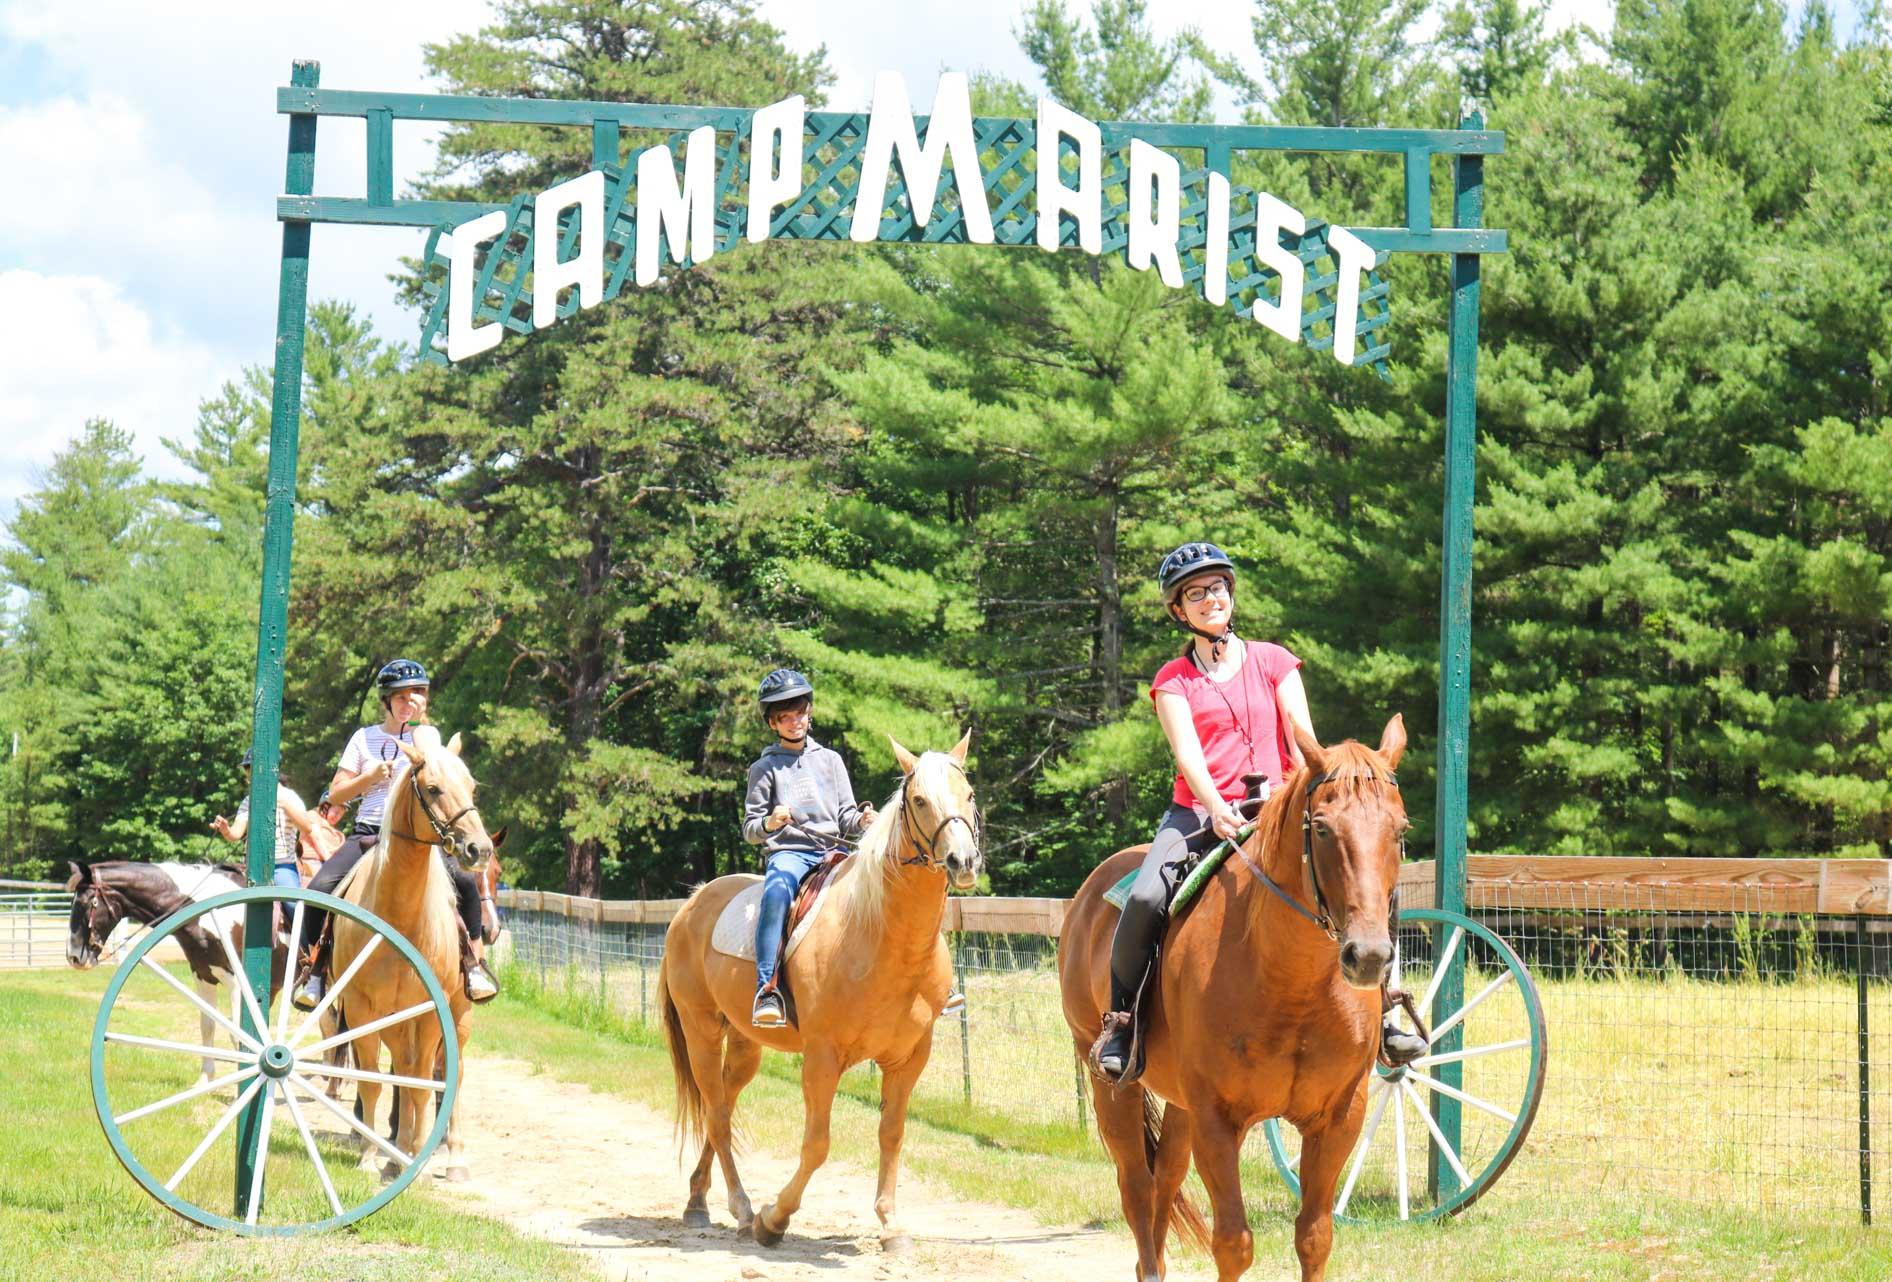 Horseback riding group passes Camp Marist sign